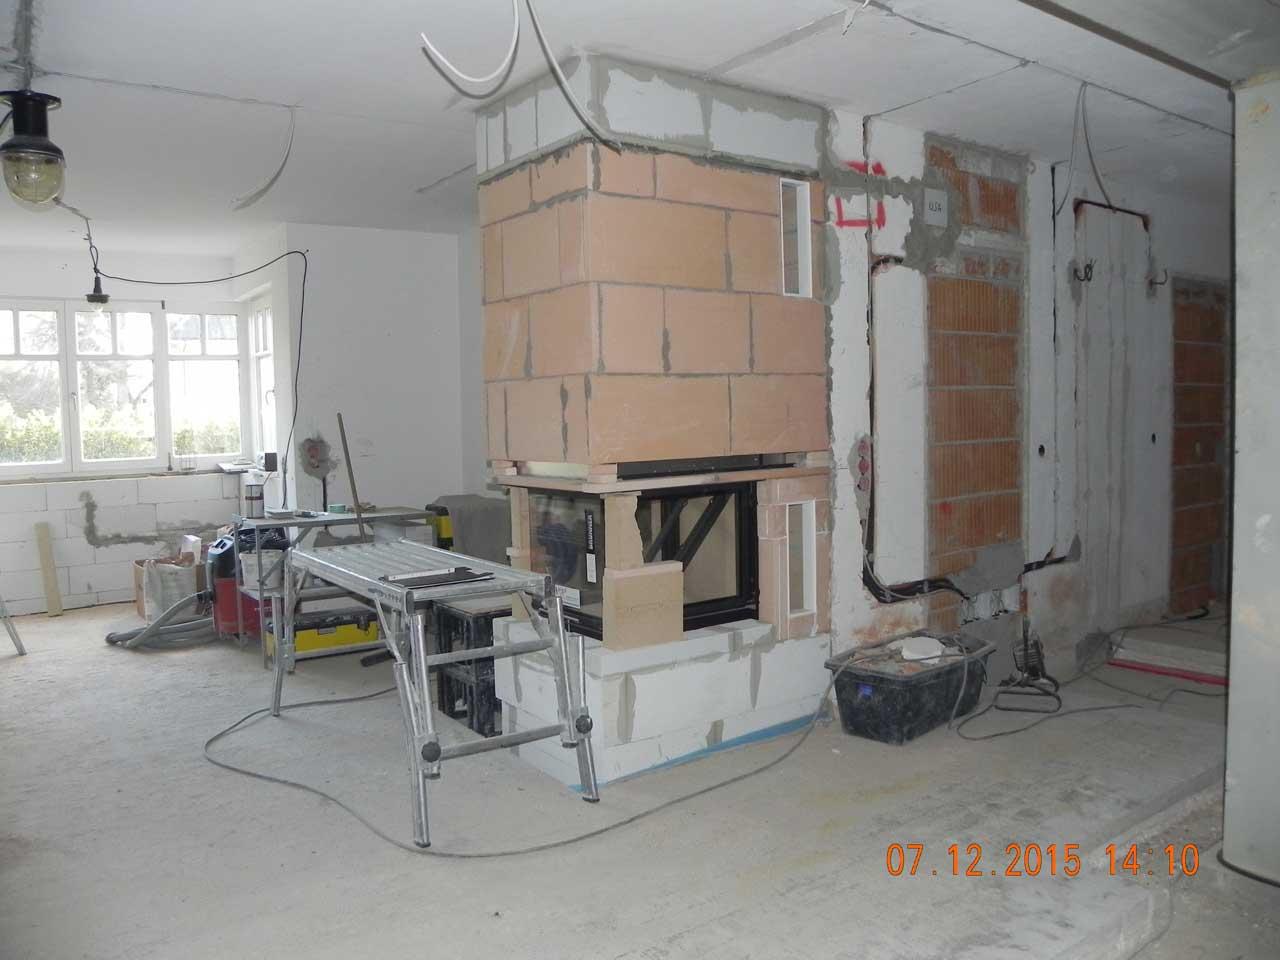 Küche & Kamin - Umbau 08